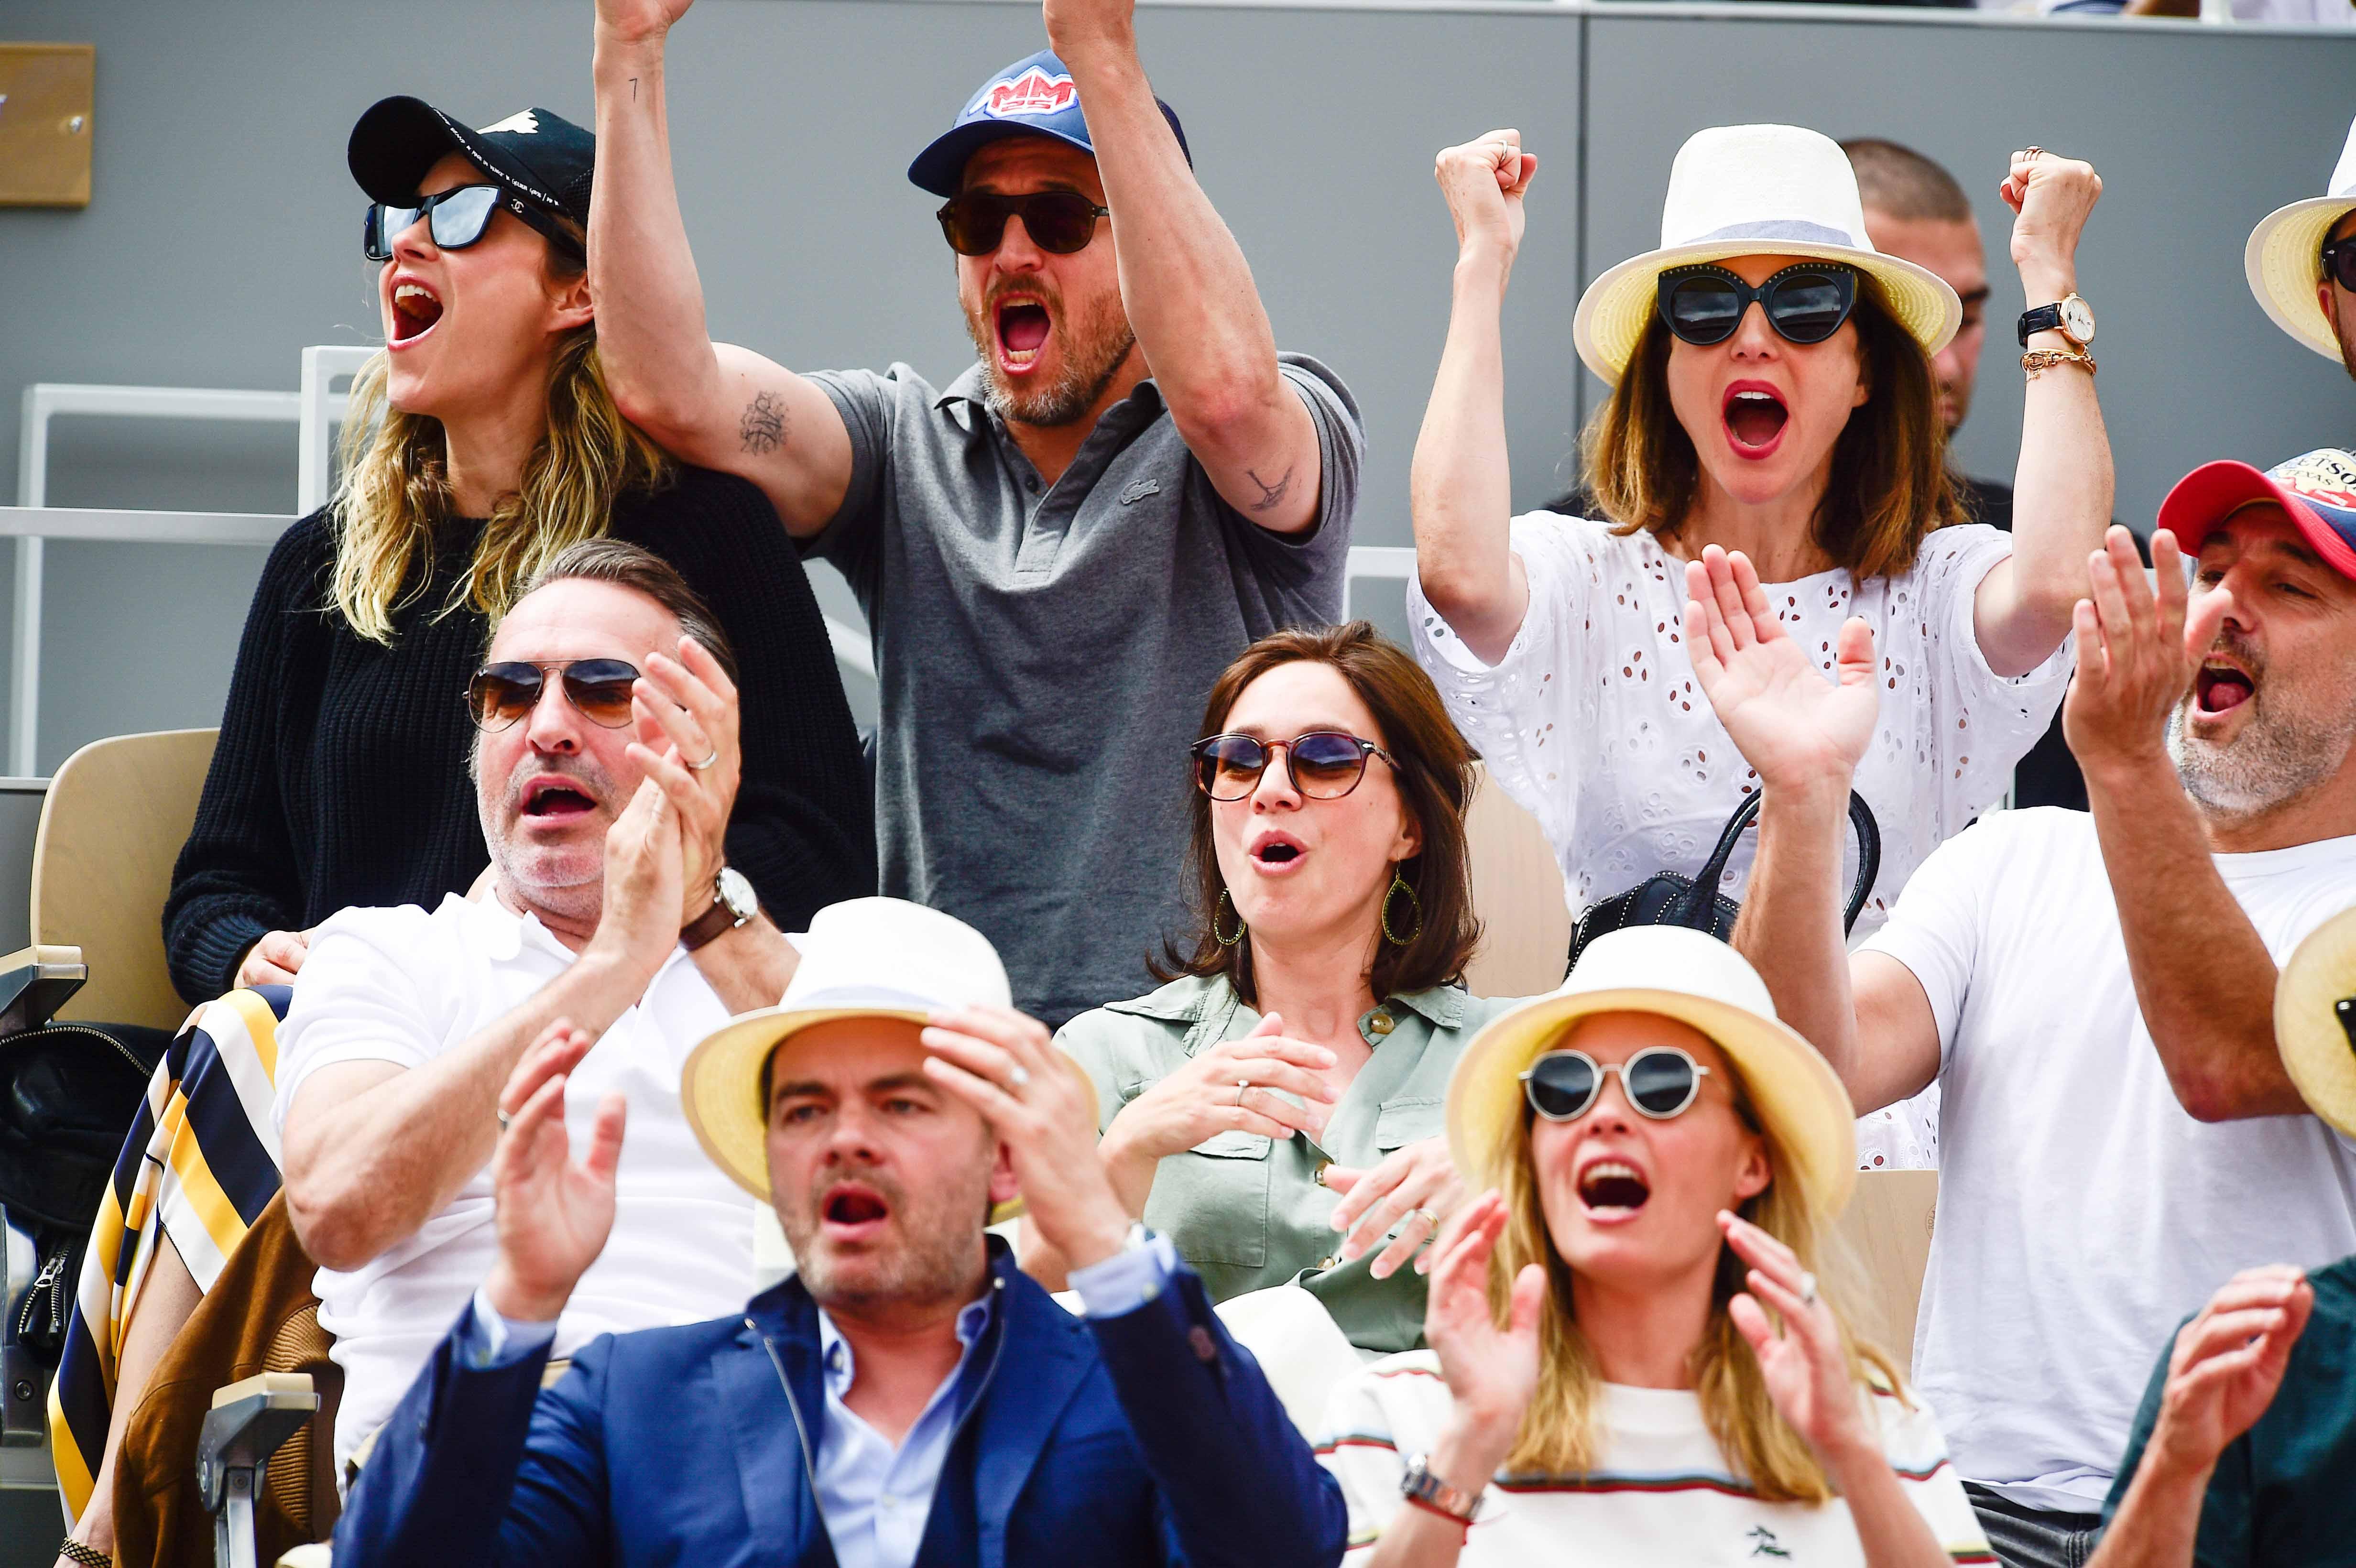 French actors Marion Cotillard, Guillaume Canet, Elsa Zylberstein, Jean Dujardin, Gilles Lellouche, Clovis Cornillac. And ice skater Nathalie Péchalat at Roland-Garros 2019